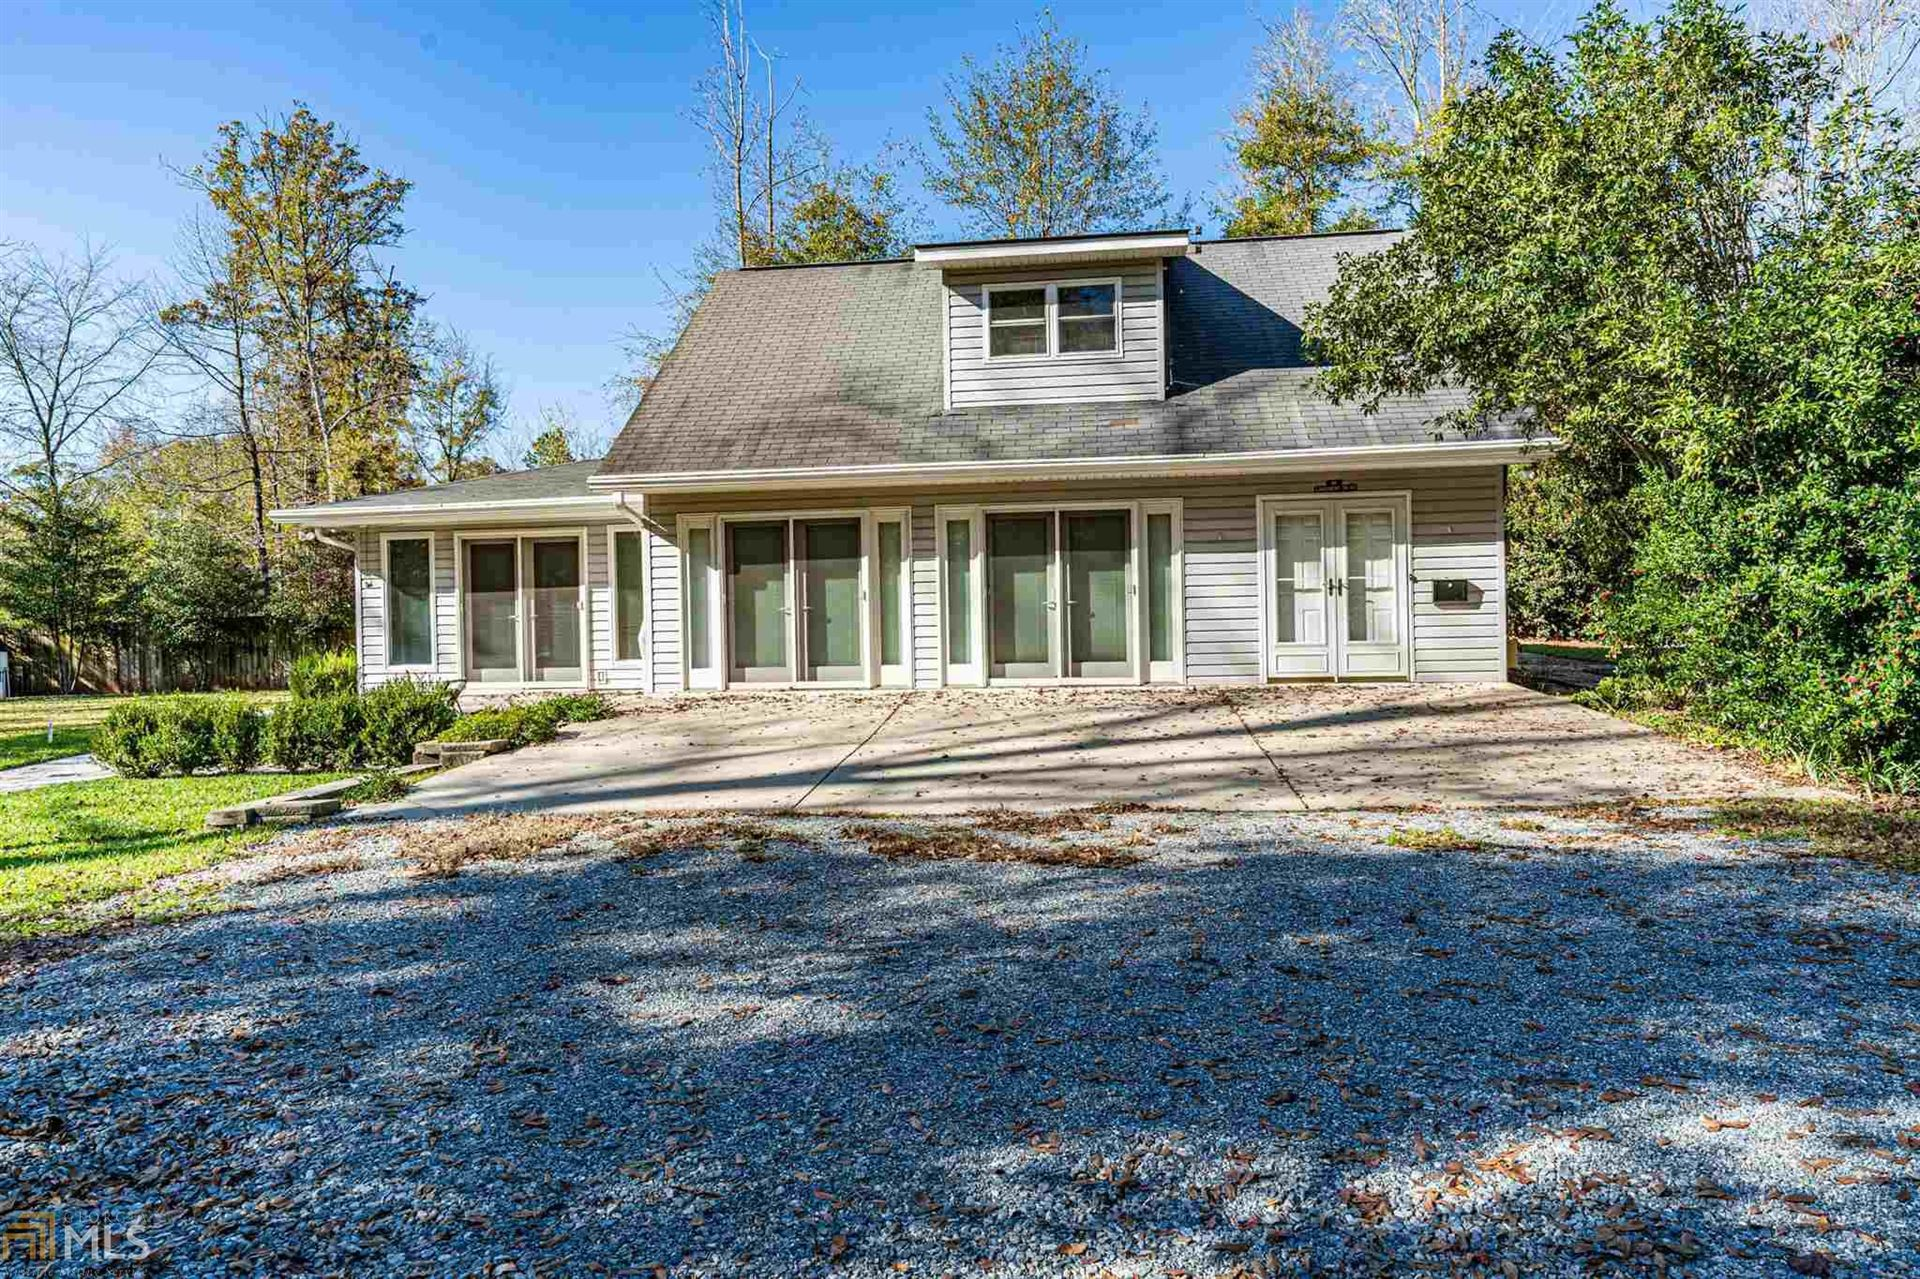 114 Lakecrest Drive, Milledgeville, GA 31061 - MLS#: 8978985